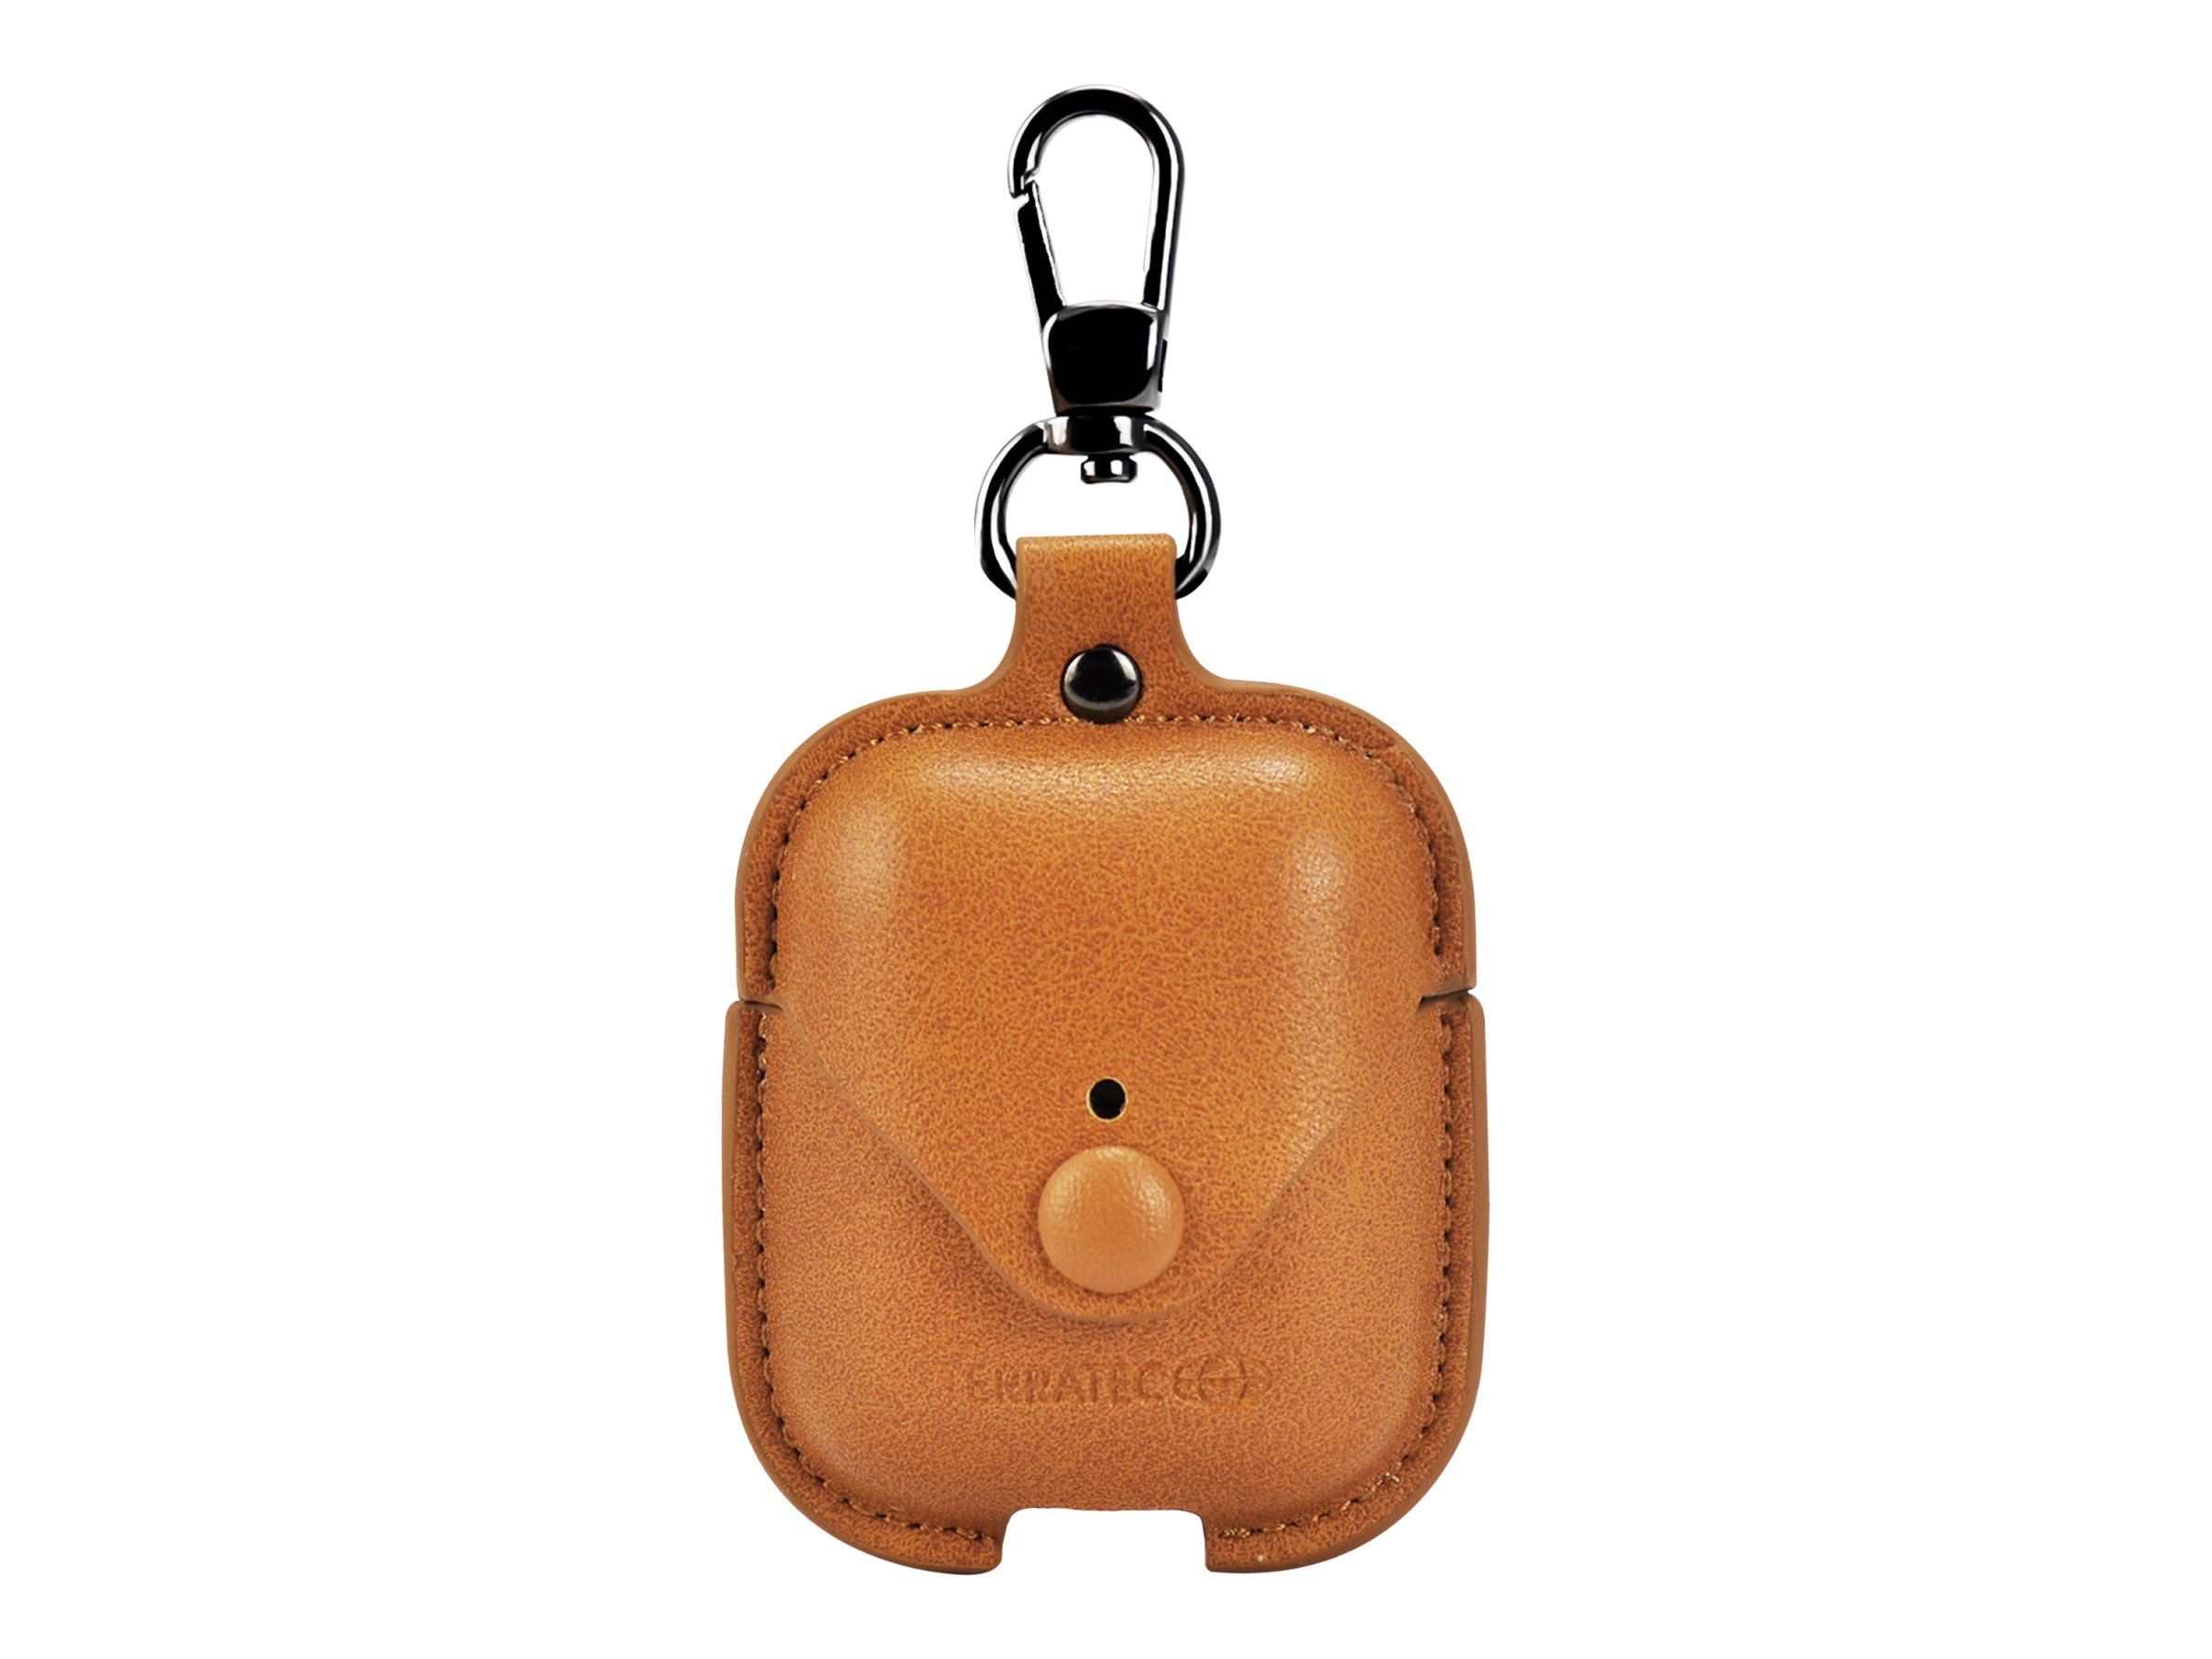 TerraTec Air Box - Tasche für Kopfhöhrer - Leder, Polycarbonat